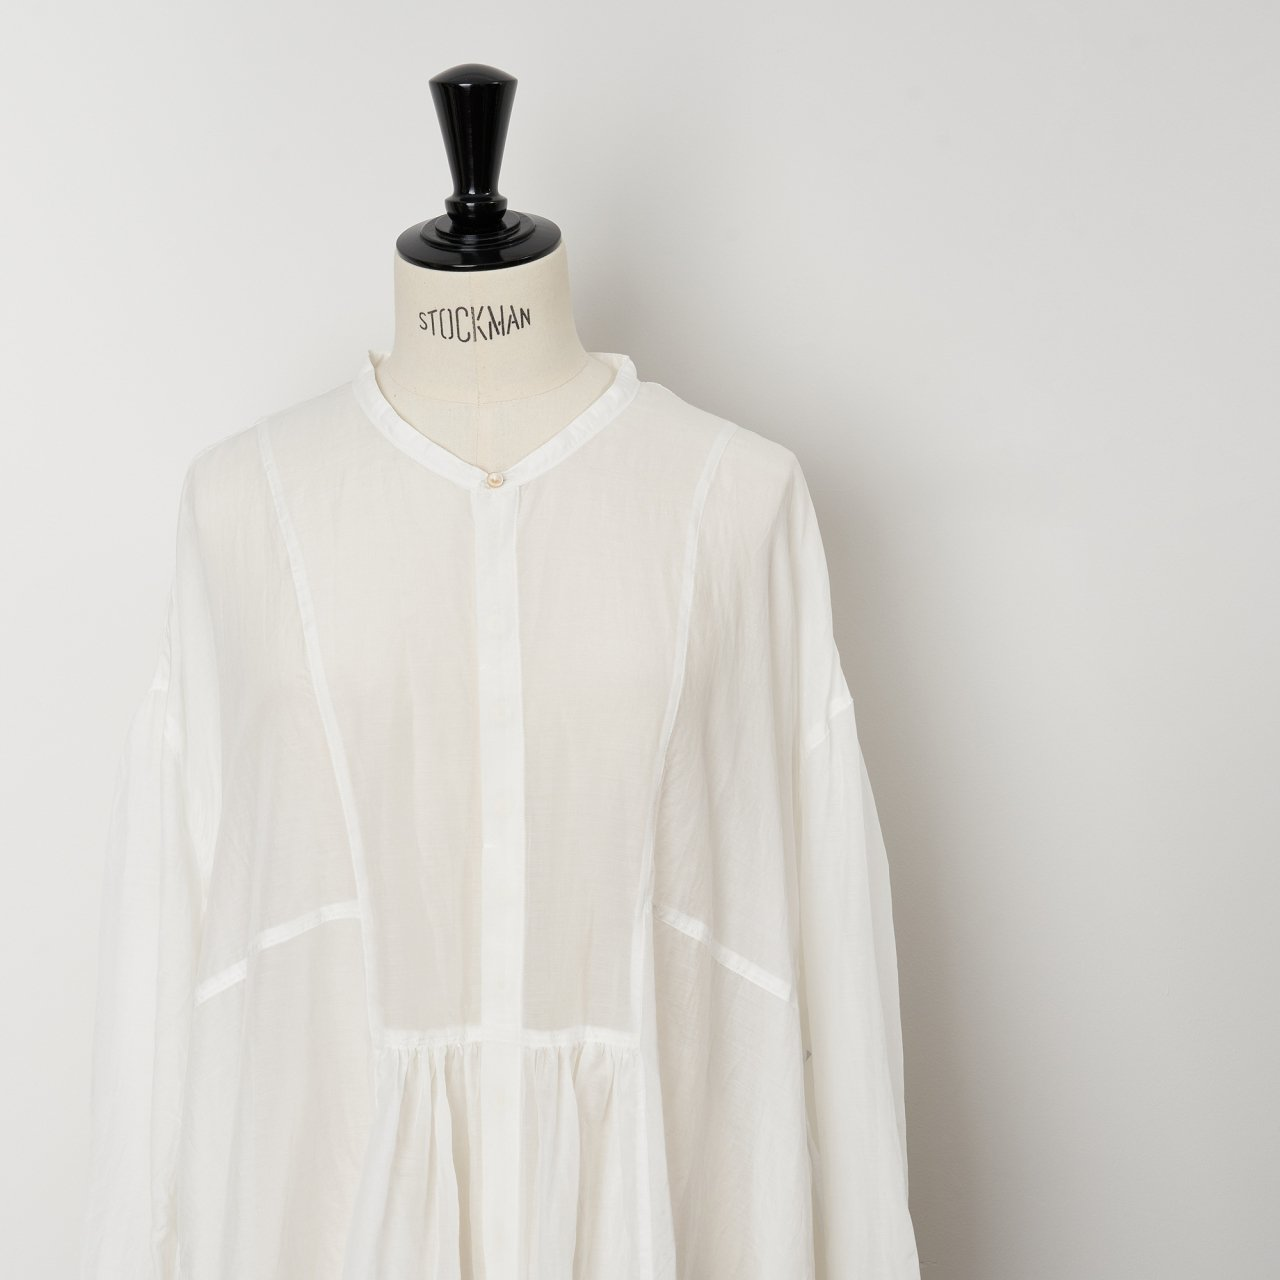 suzuki takayuki<BR>broad blouse<BR>nude